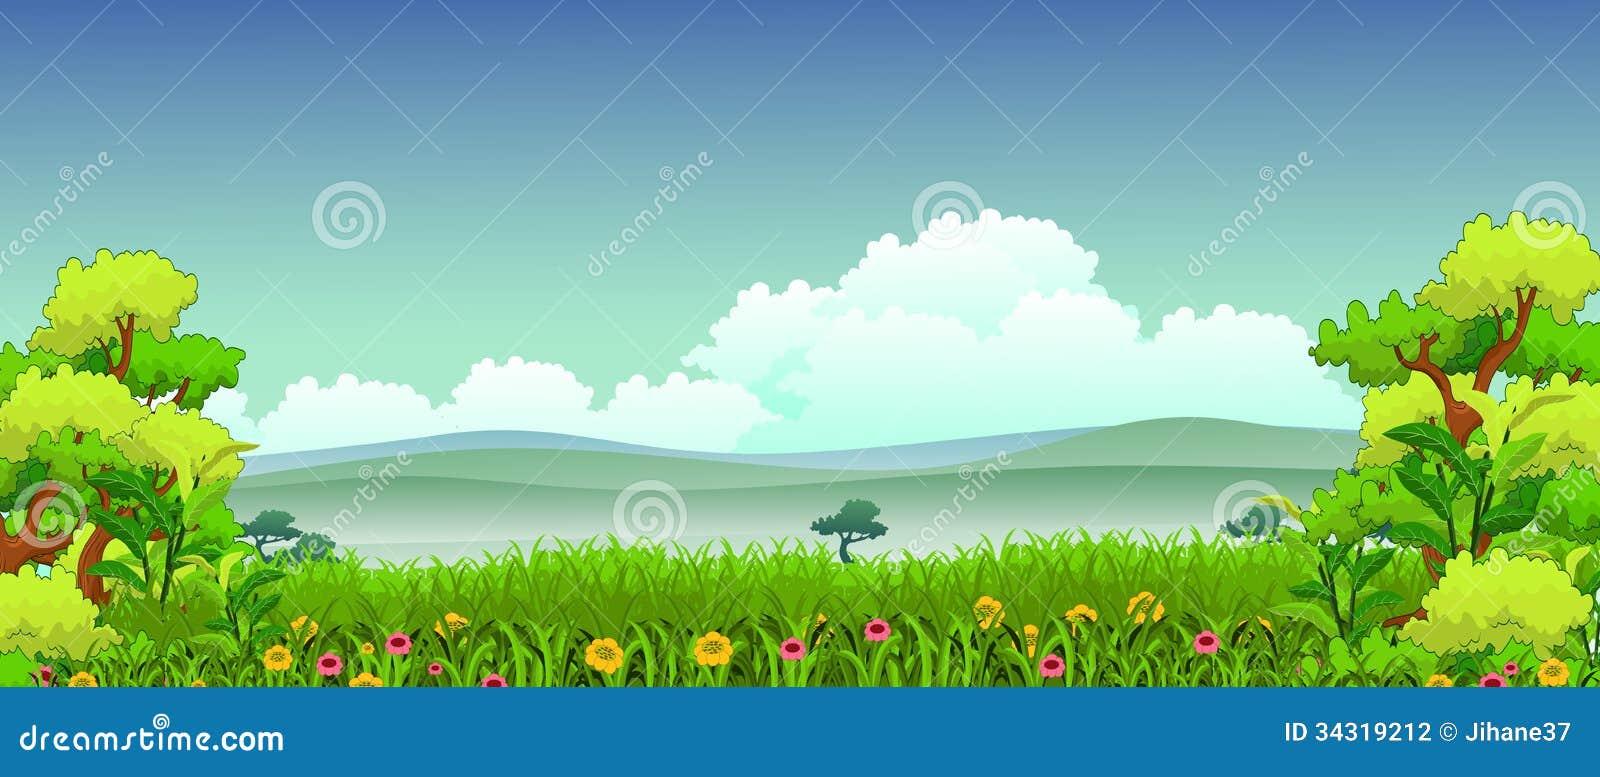 Beauty Nature Background Stock Photography - Image: 34319212